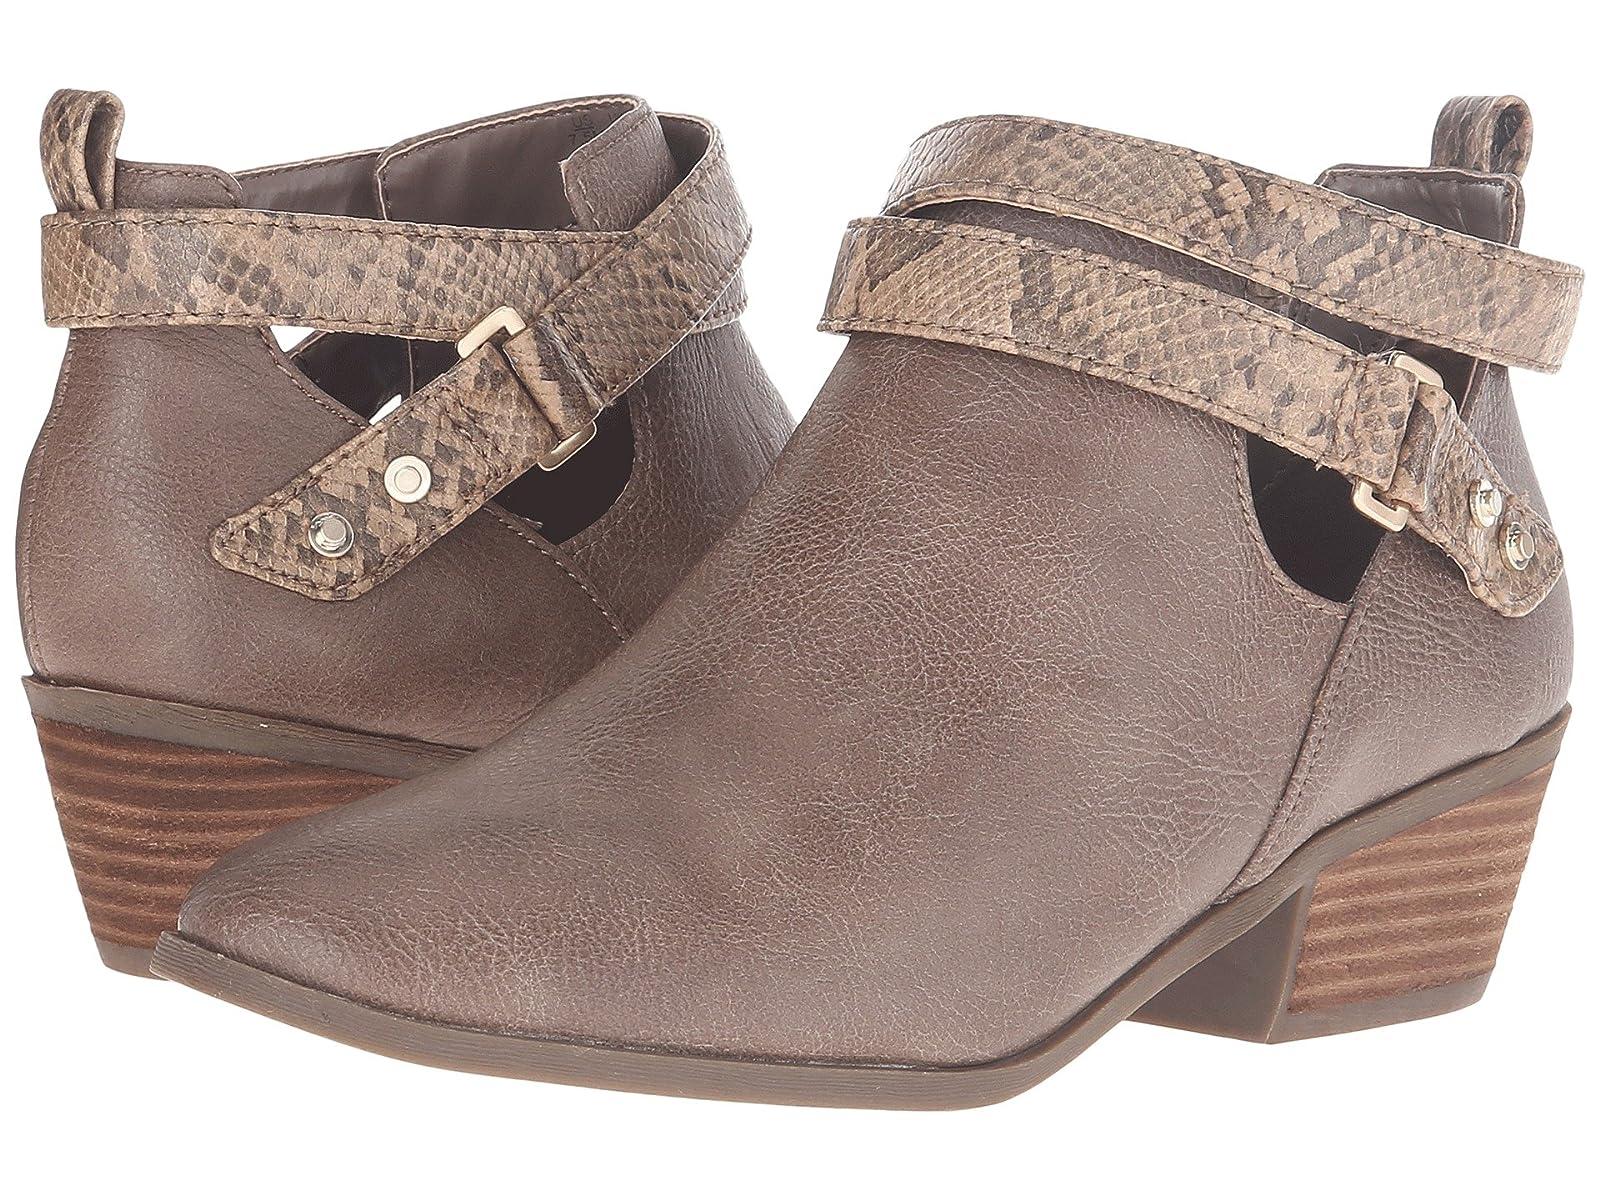 Dr. Scholl's BaxterCheap and distinctive eye-catching shoes